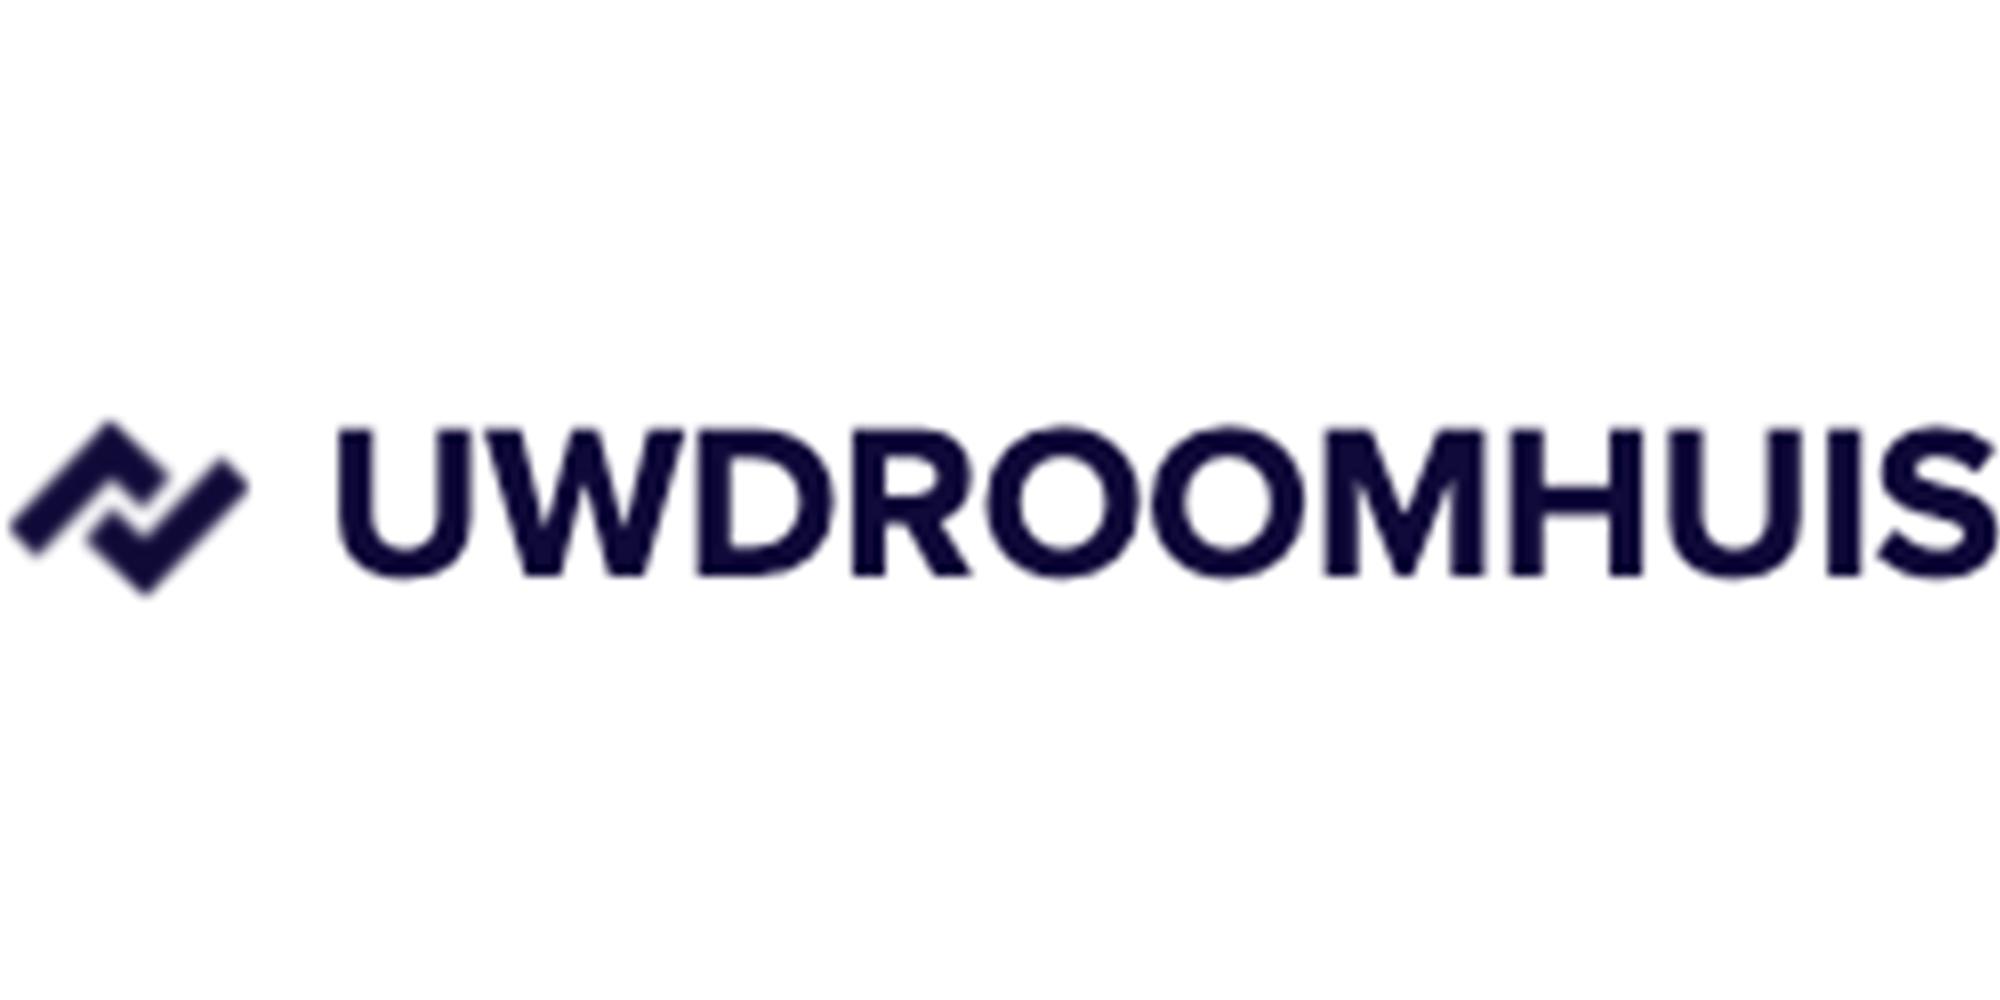 Uwdroomhuis logo